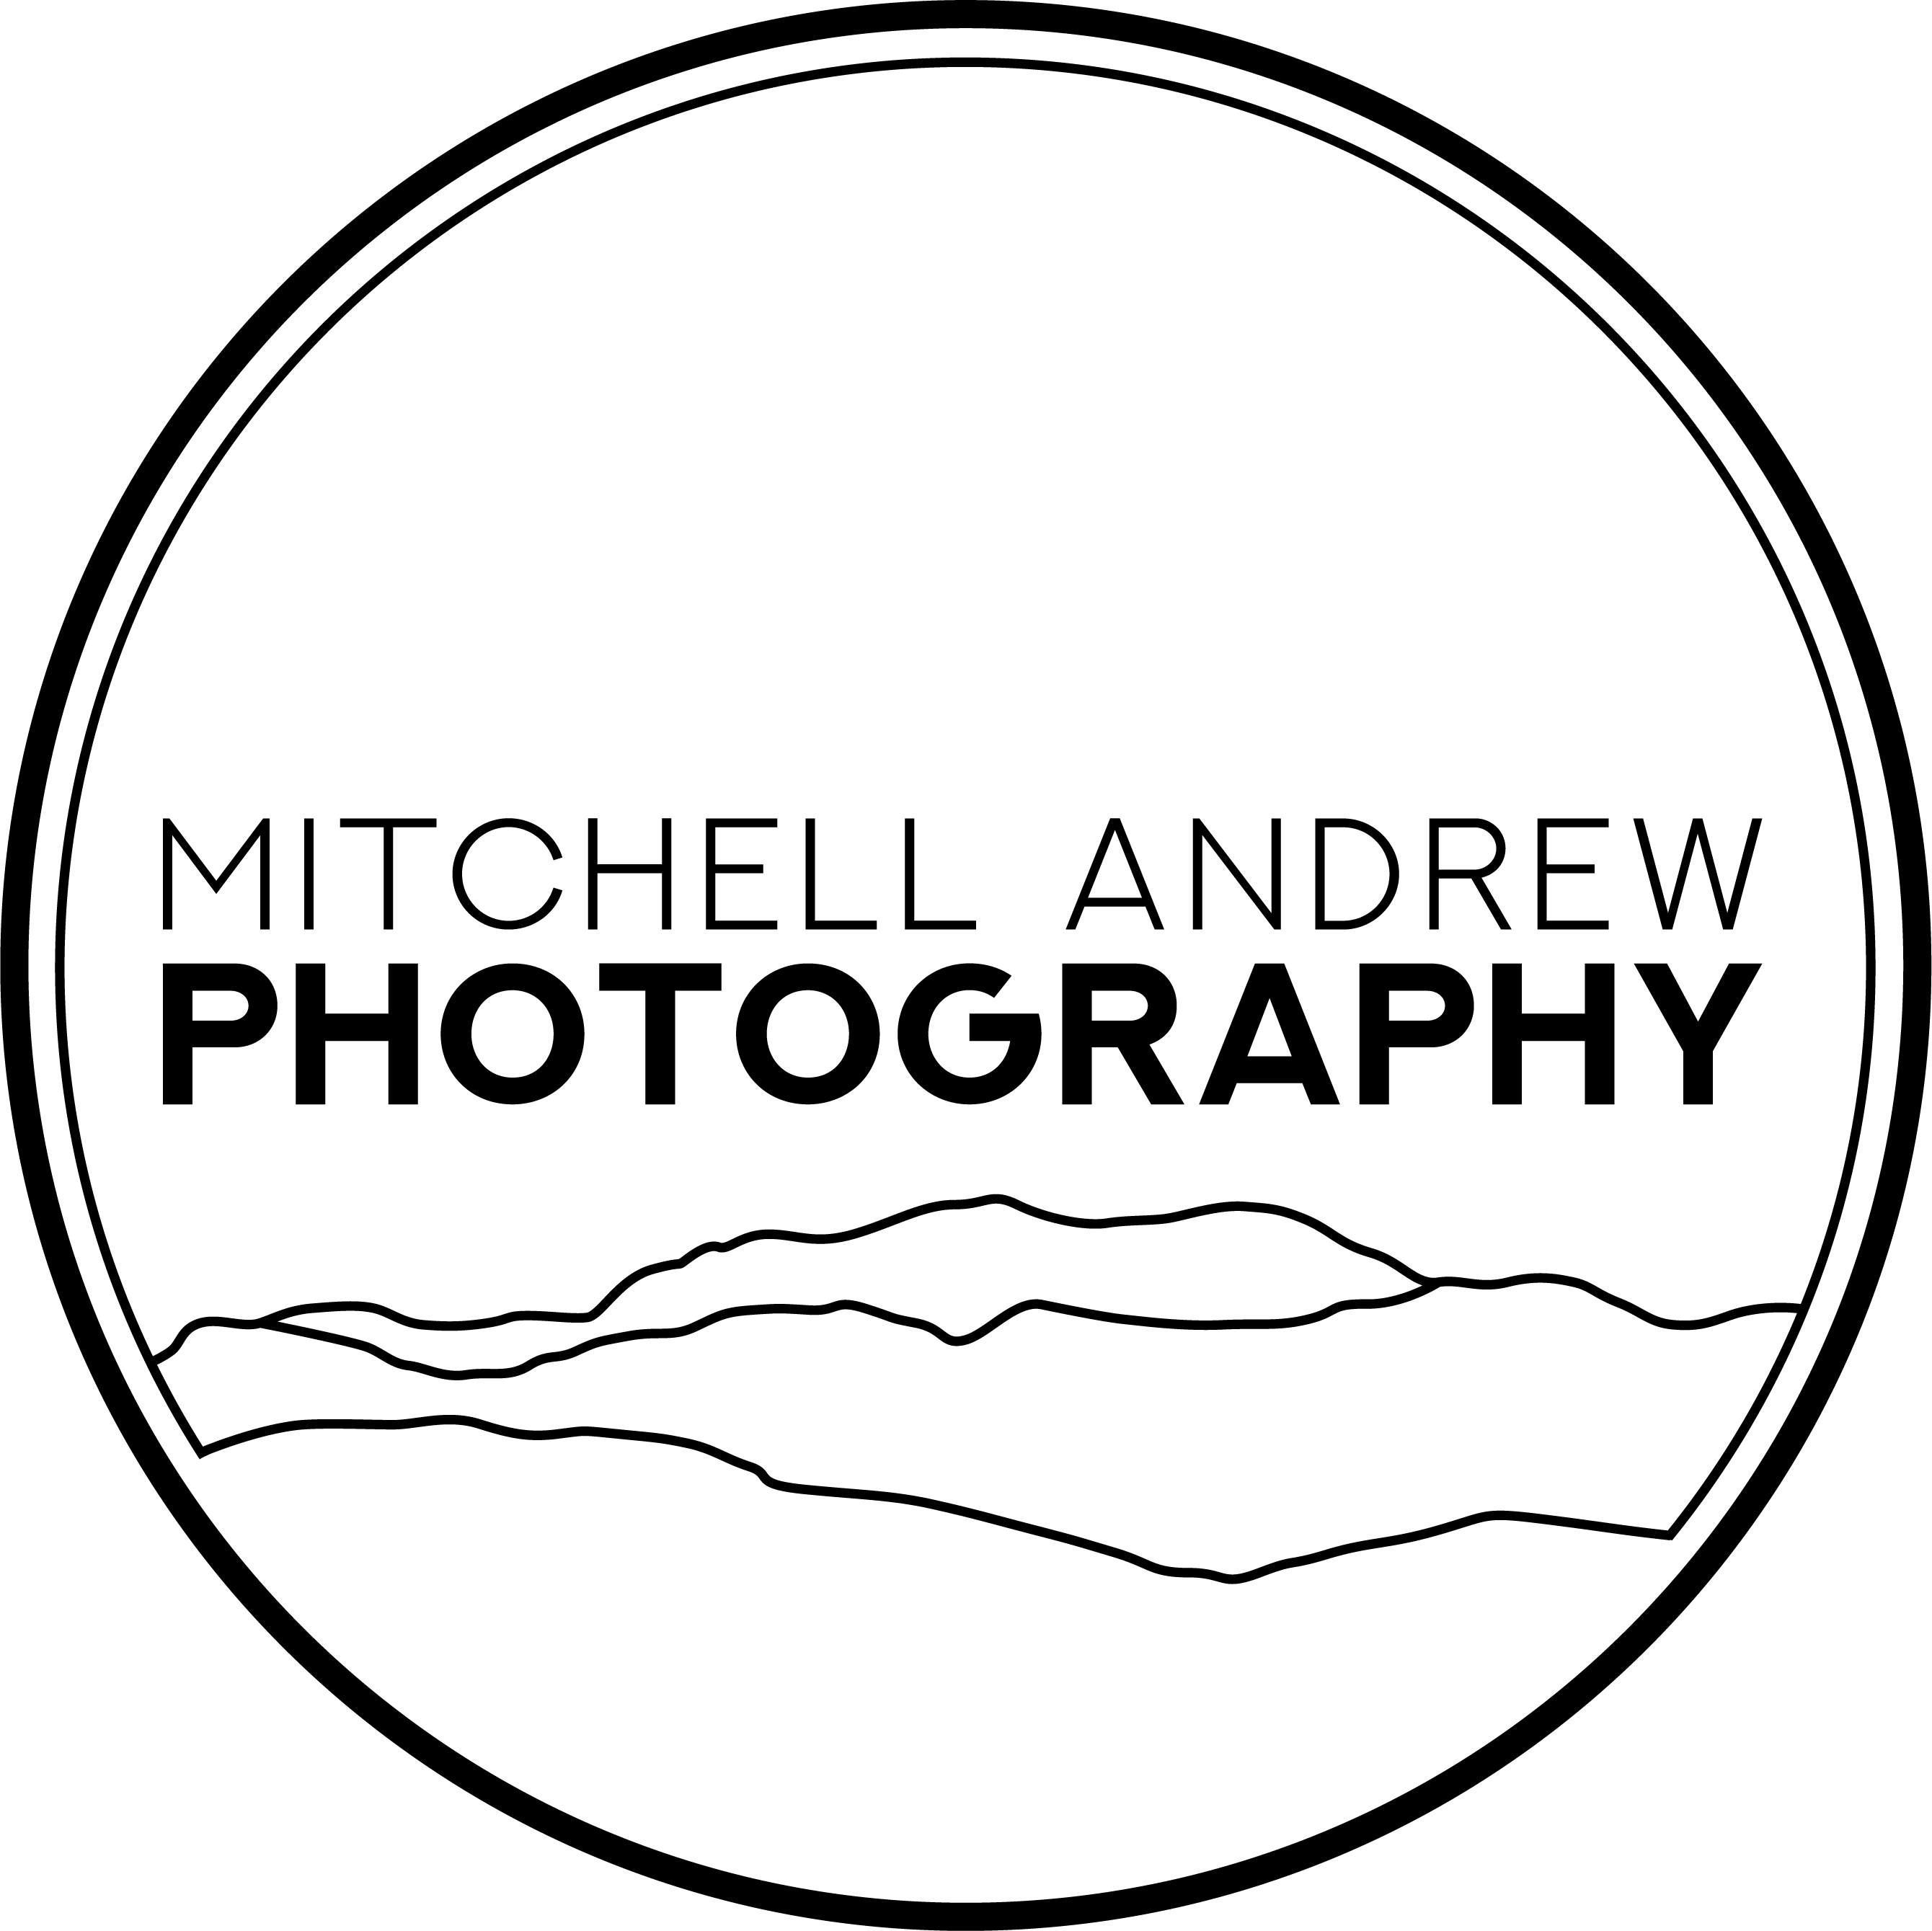 Mitchell Andrew Photography